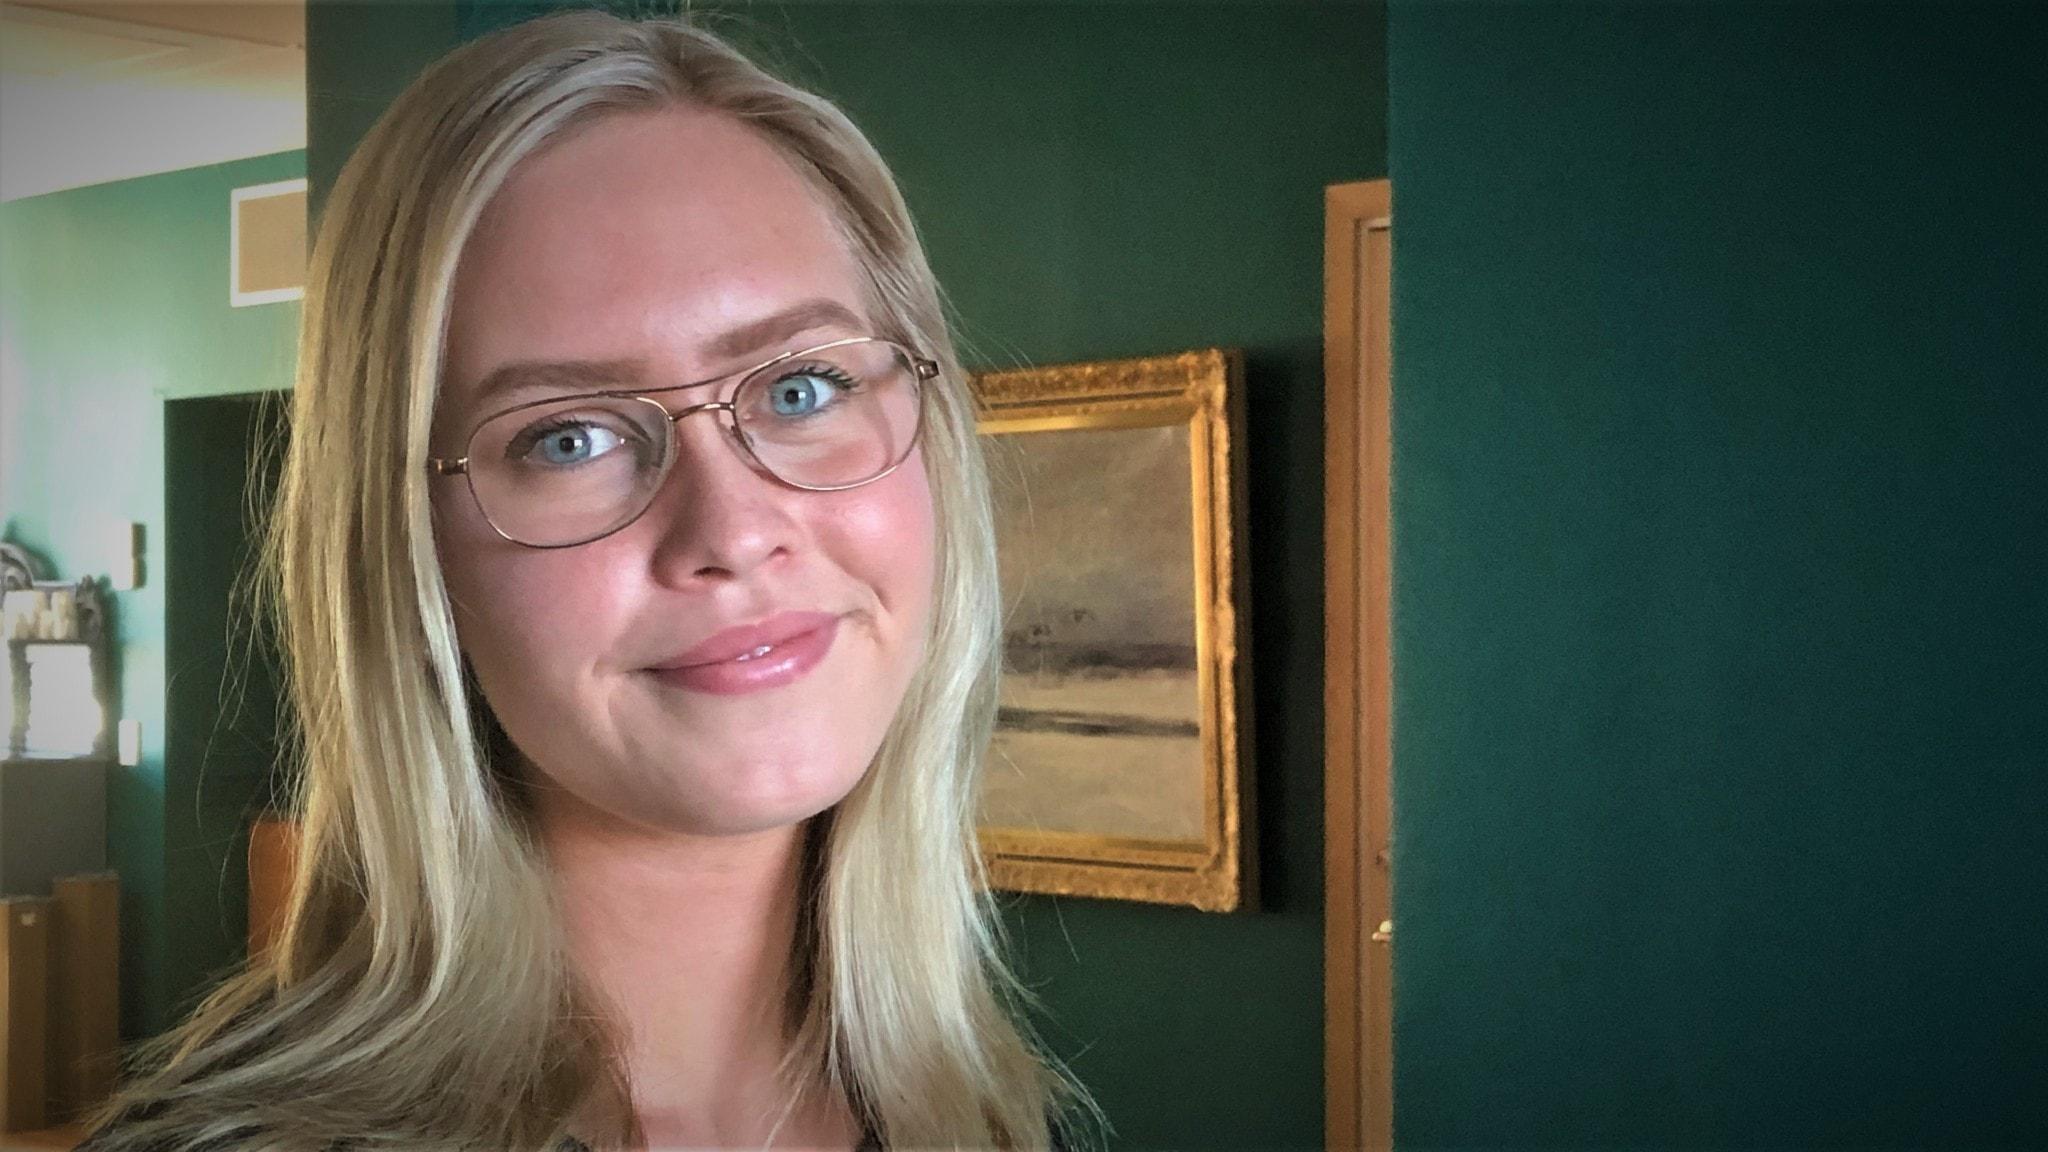 Emilia Bertilsson, student